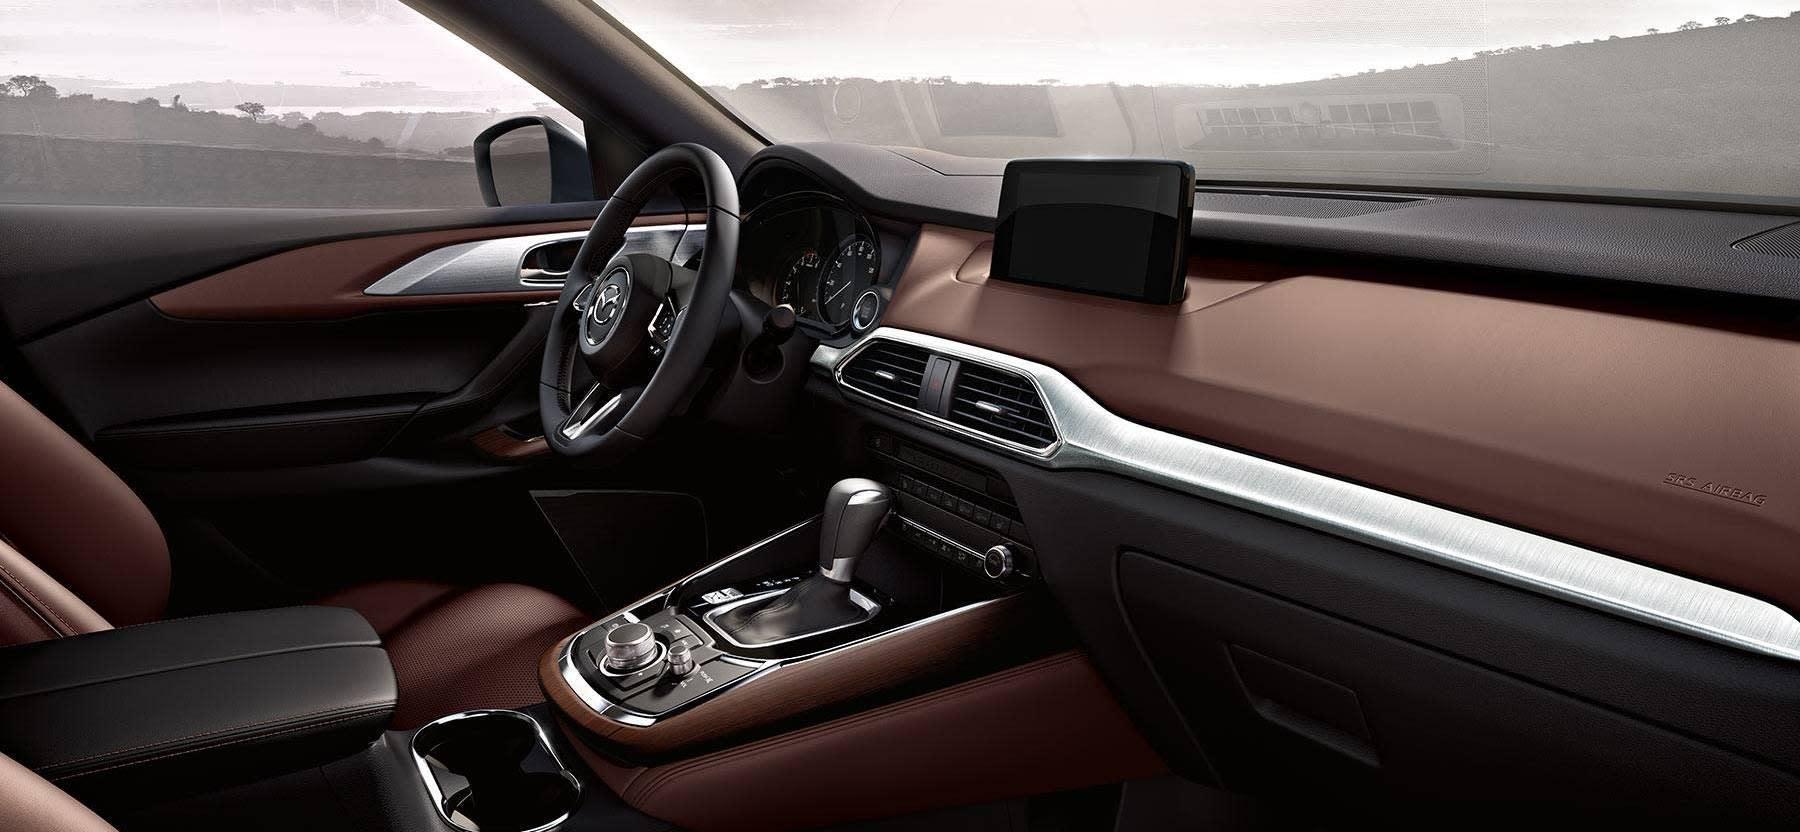 Upscale Amenities in the 2019 Mazda CX-9